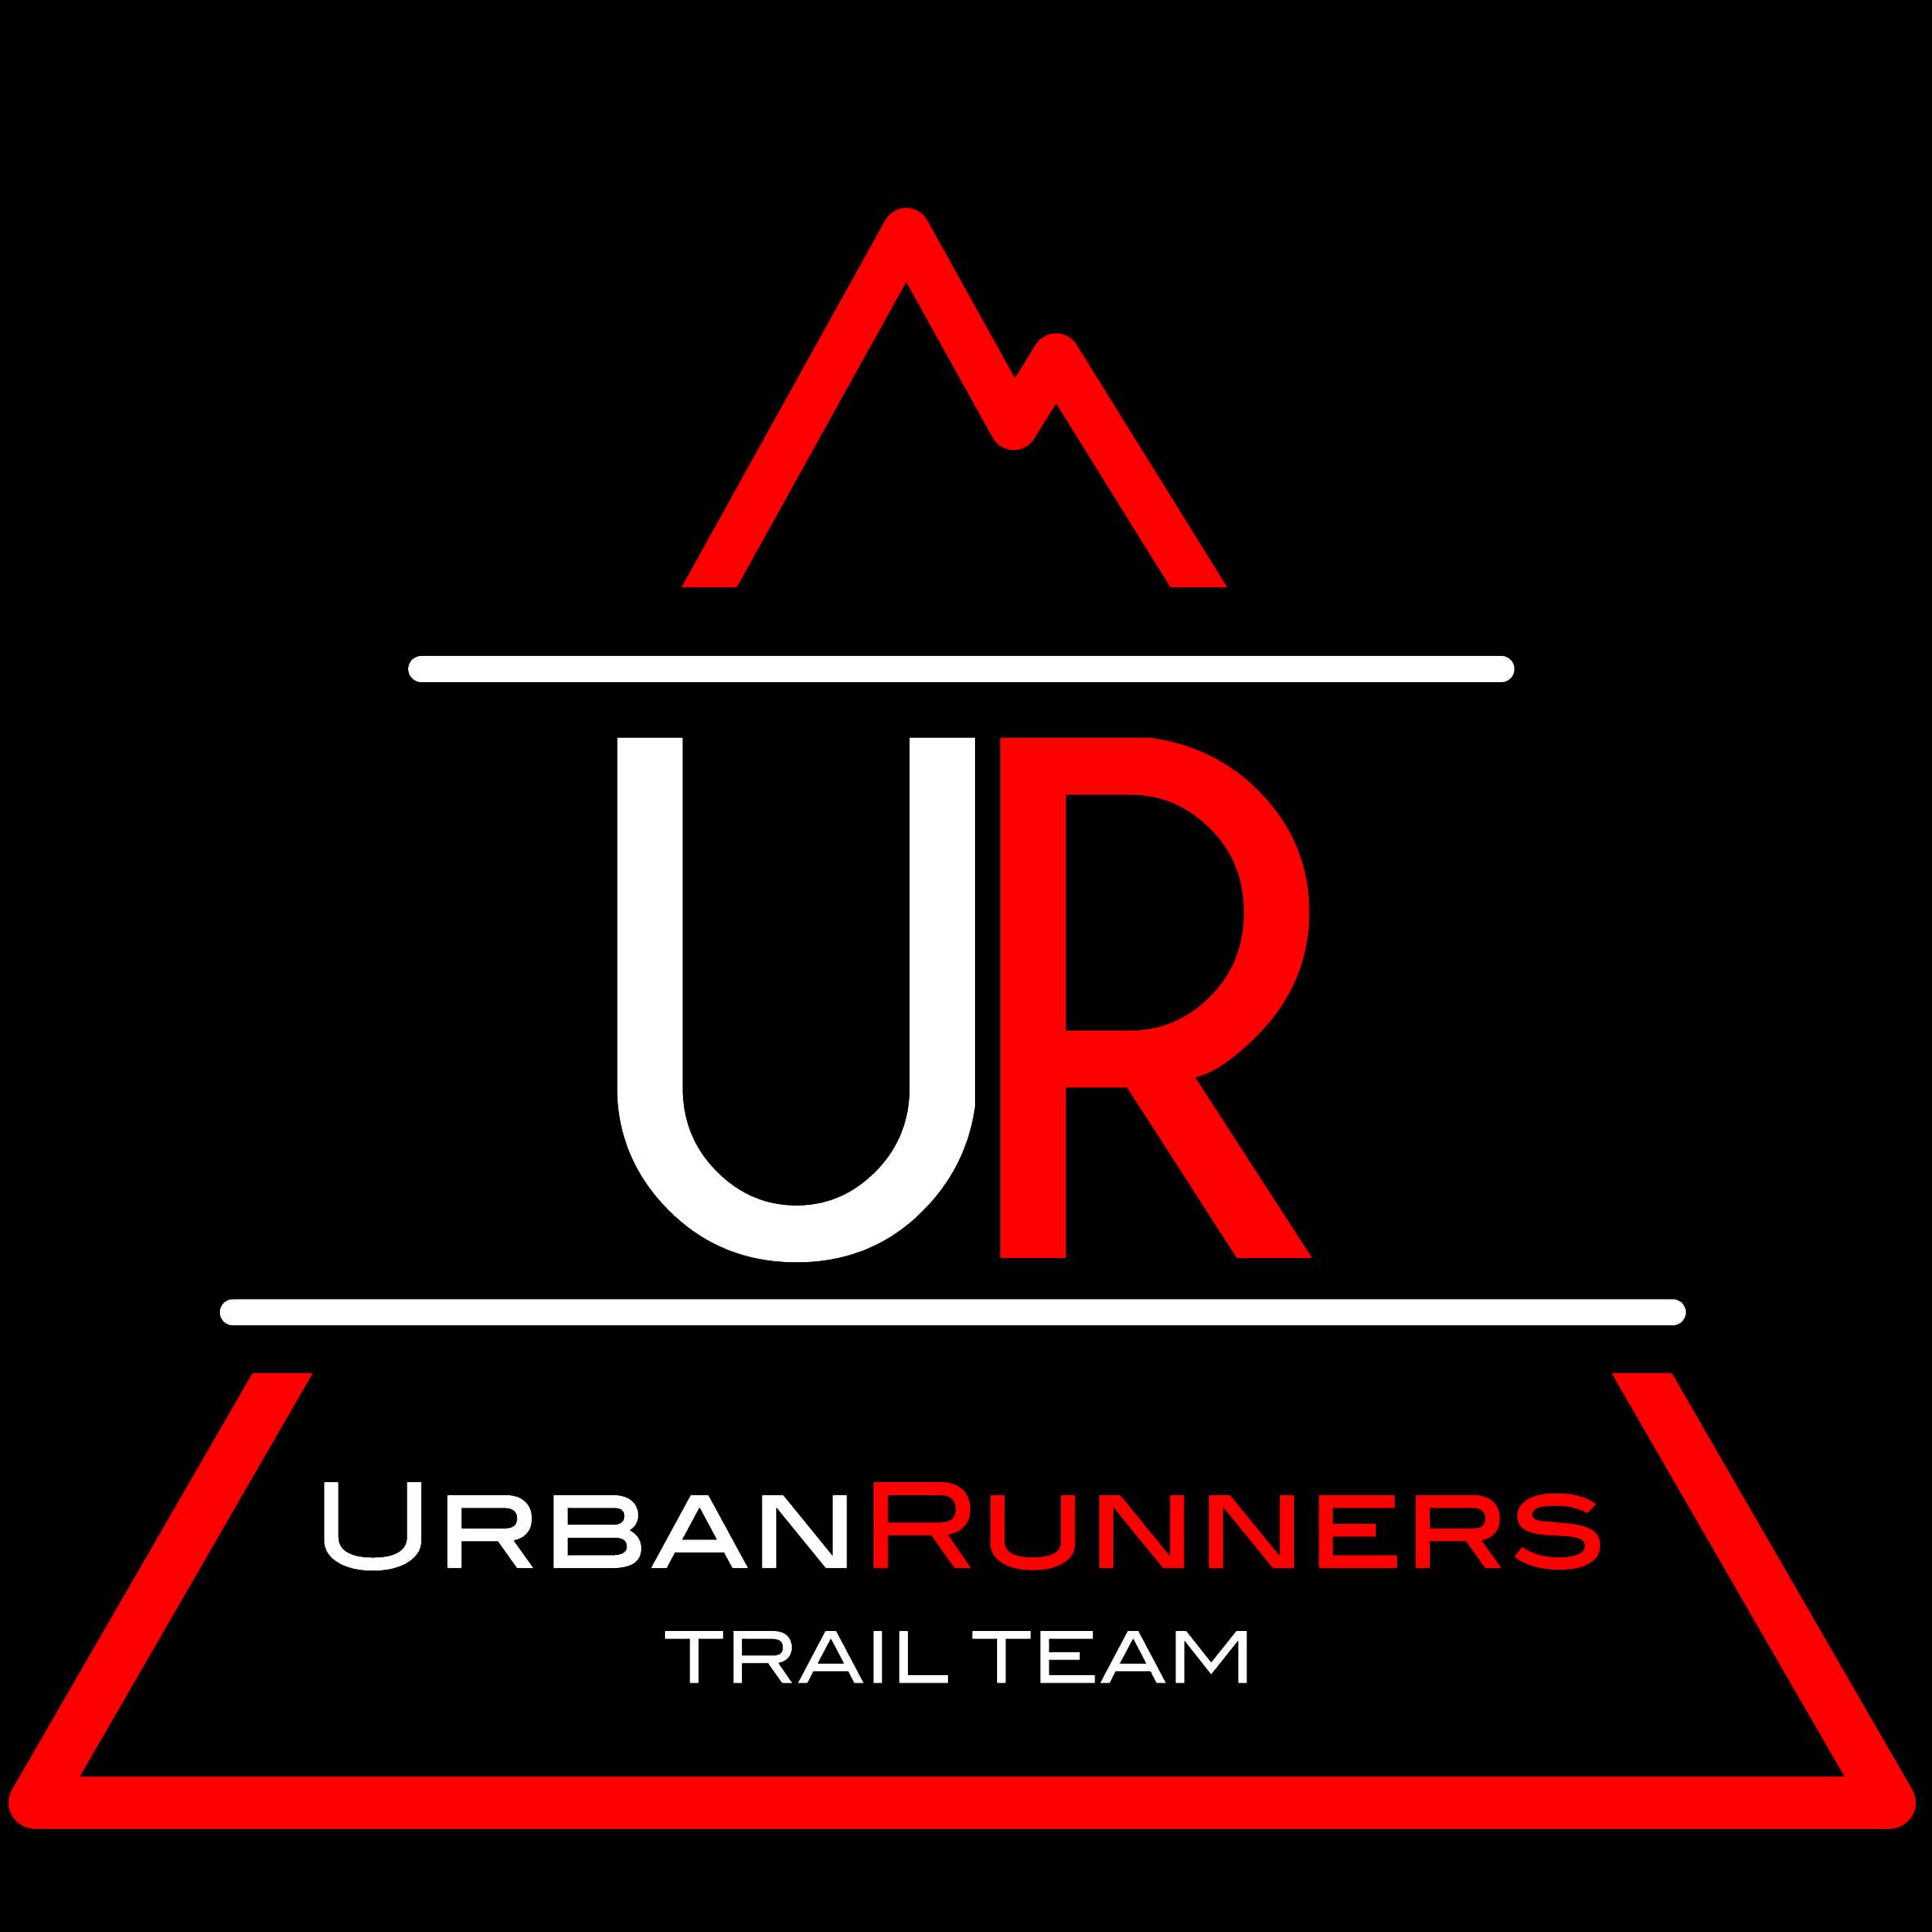 UR_Trail_Training